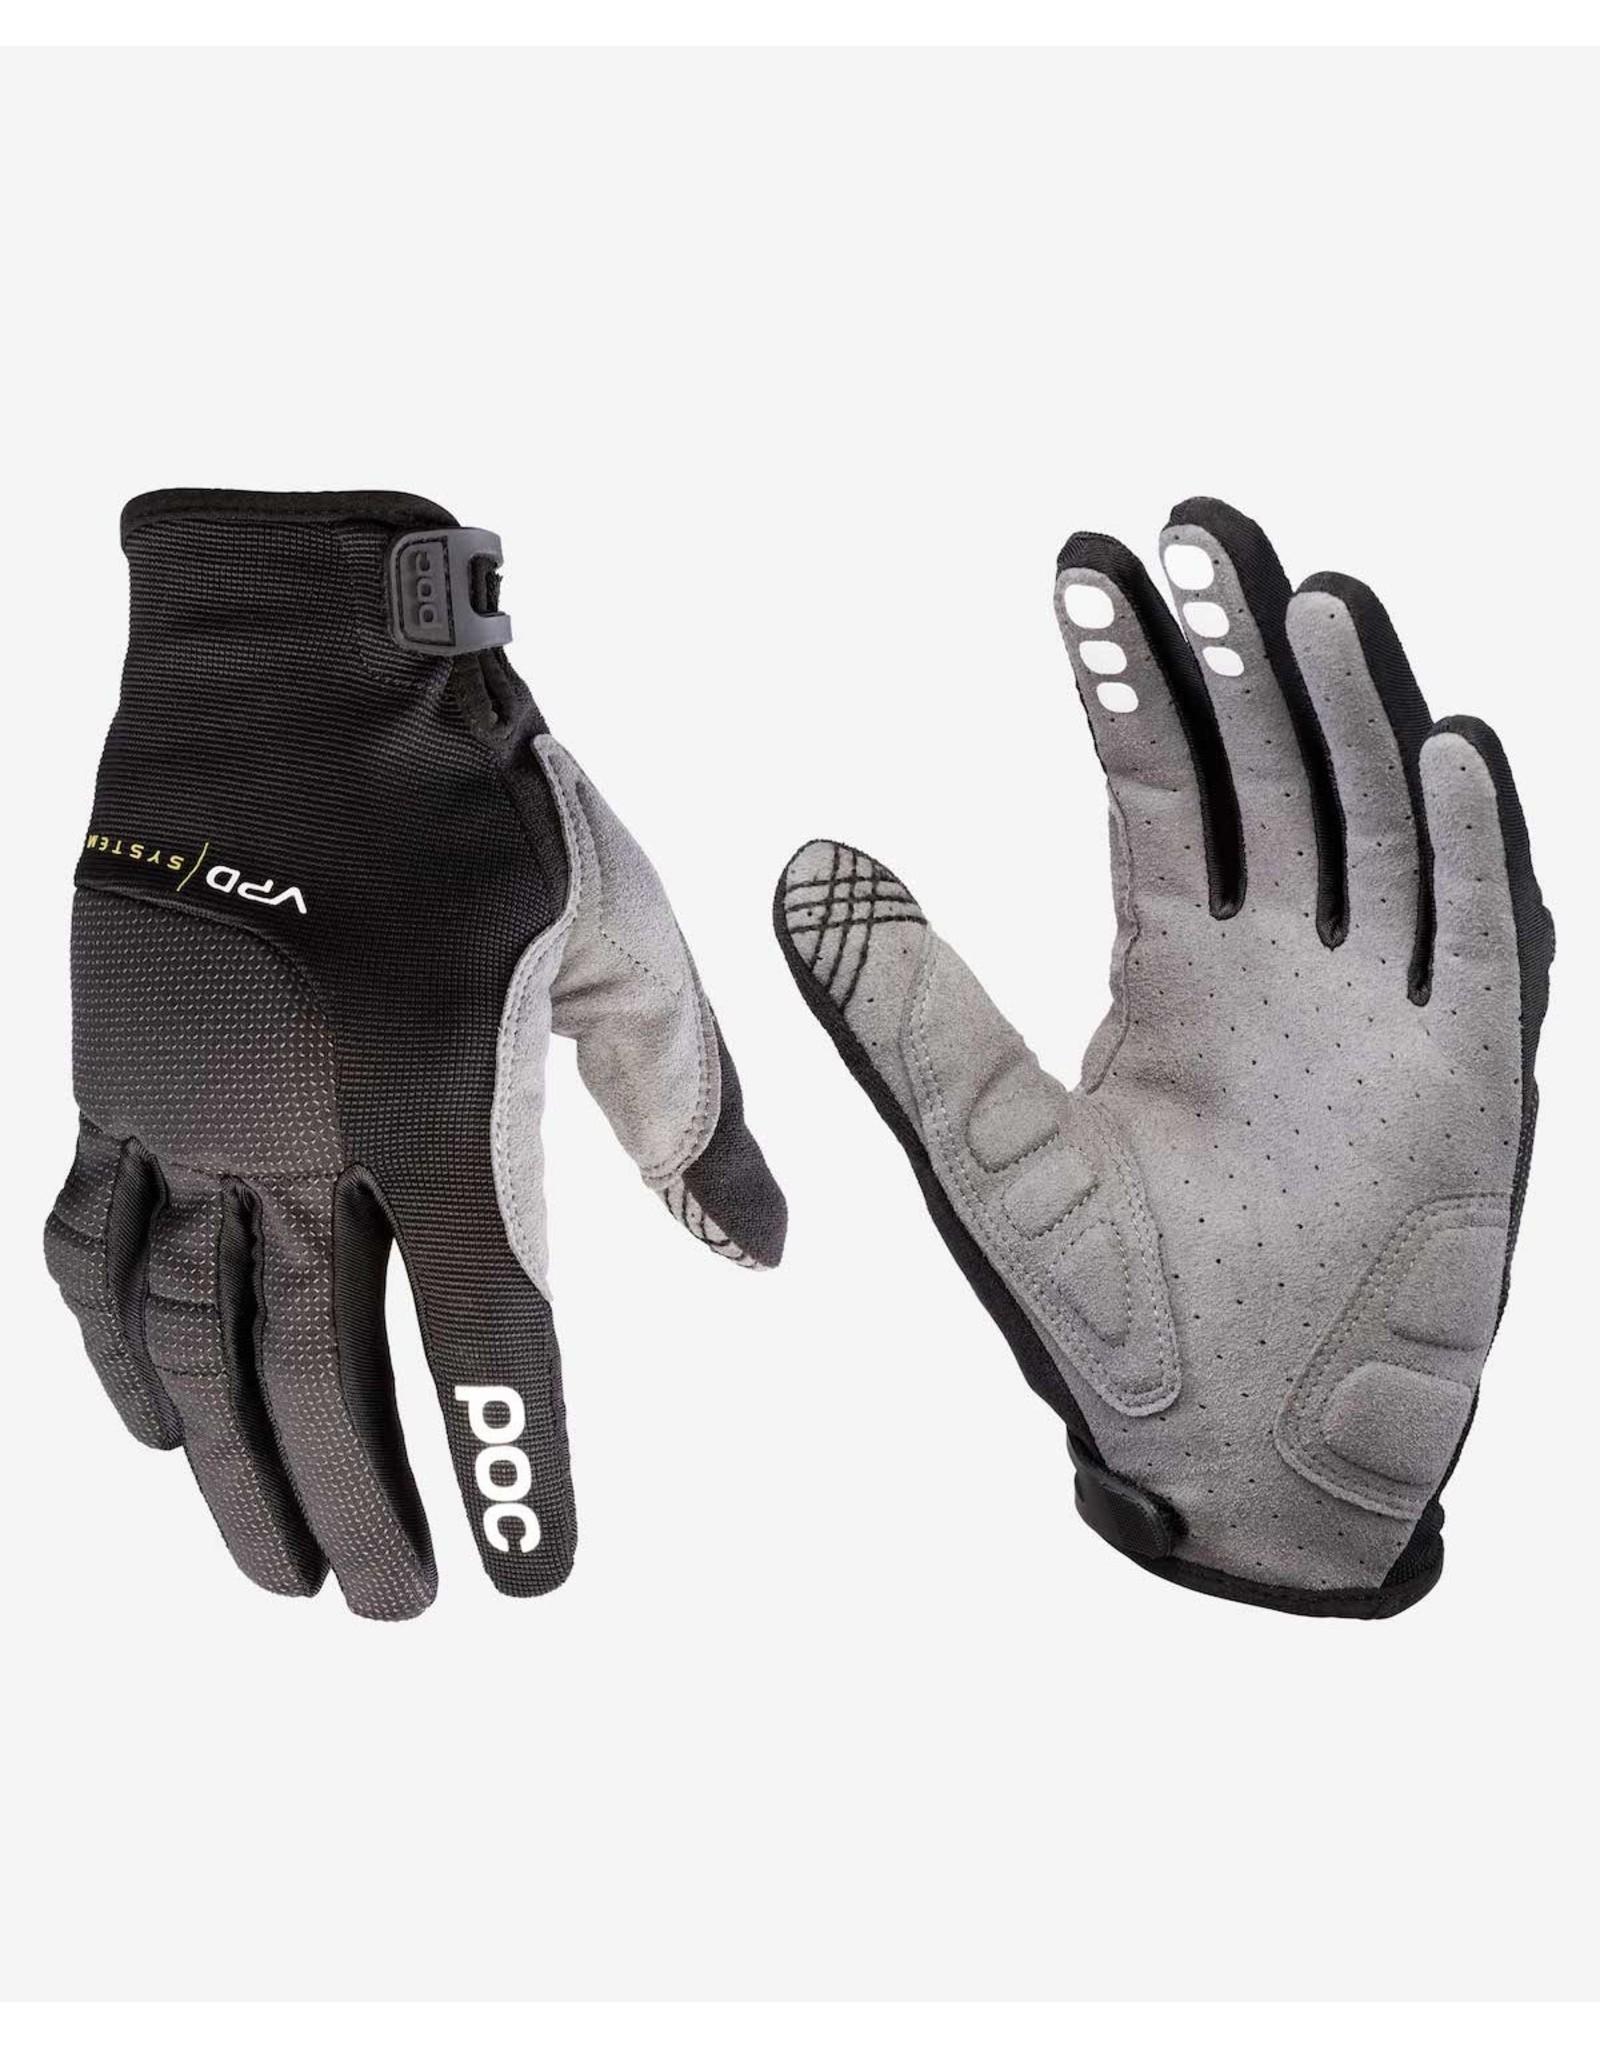 POC POC Resistance Pro DH Glove